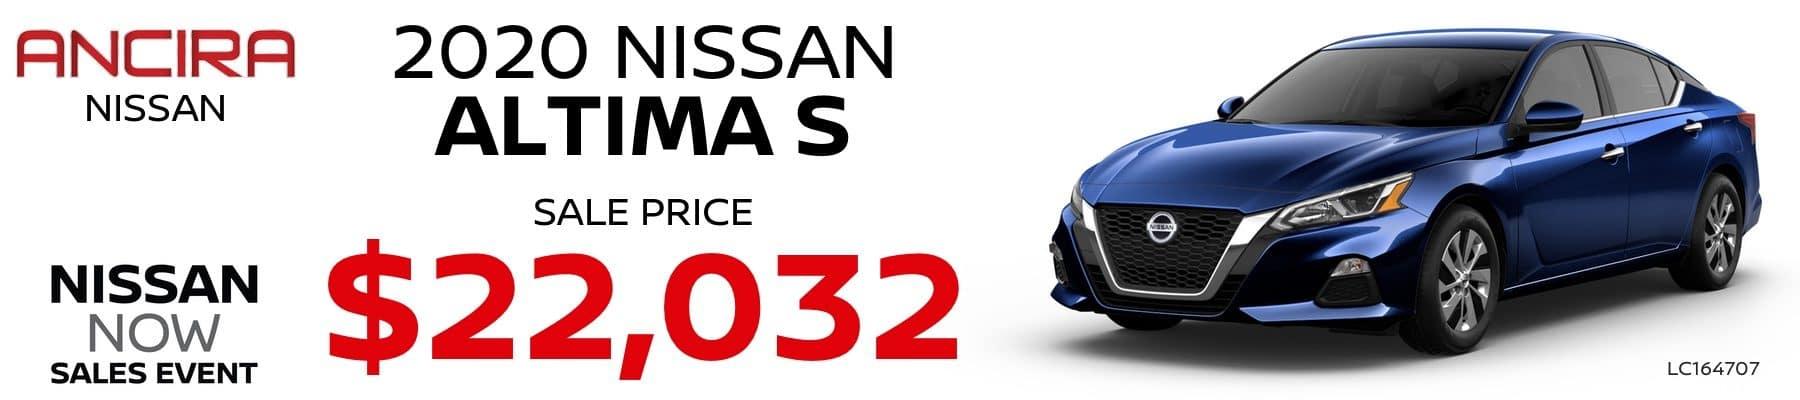 2020 Nissan Altima - Ancira Nissan San Antonio, TX